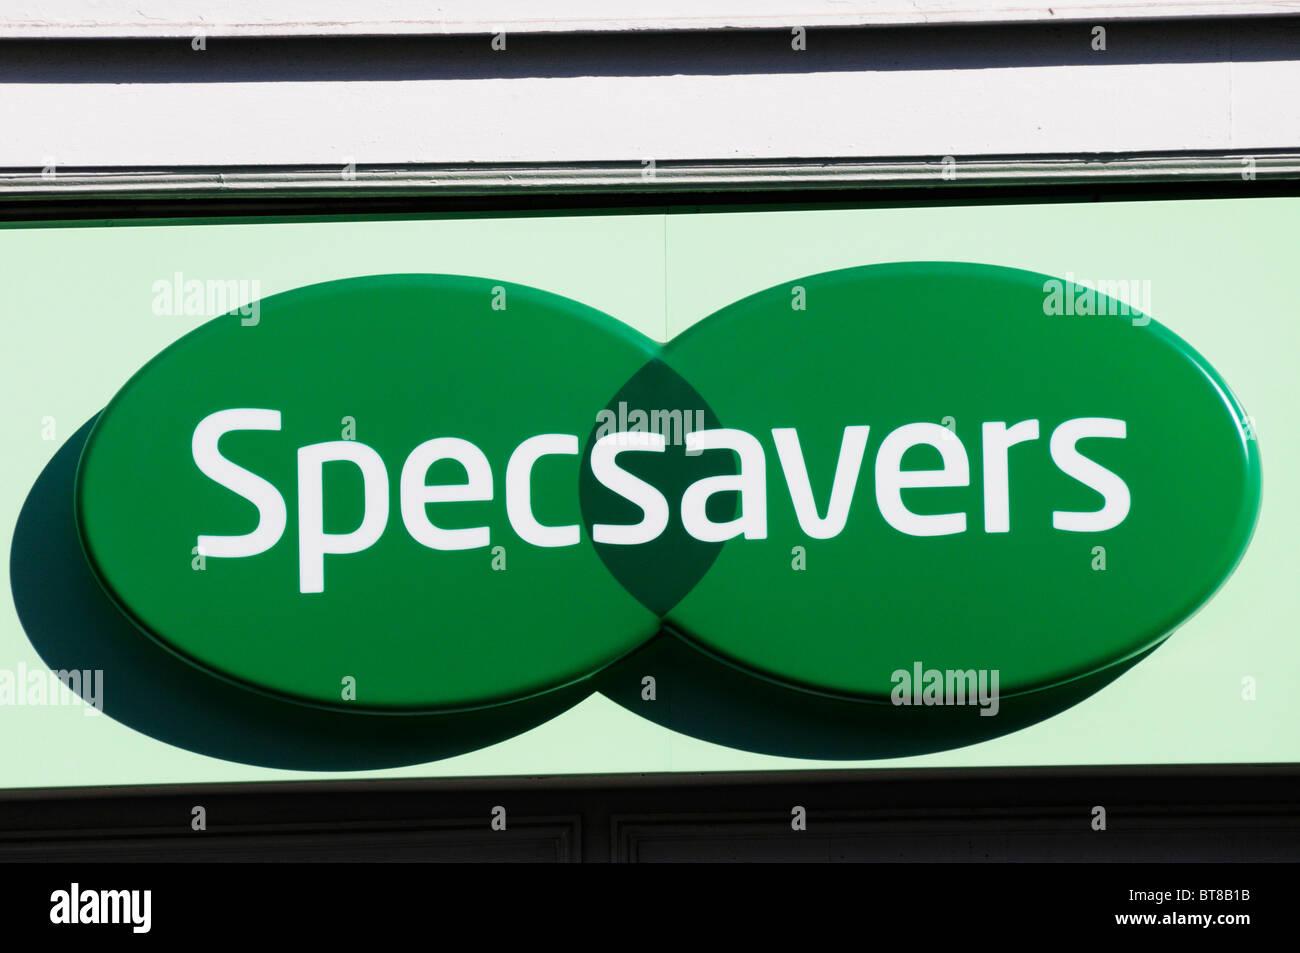 Specsavers Opticians sign logo, London, England, UK Stock Photo